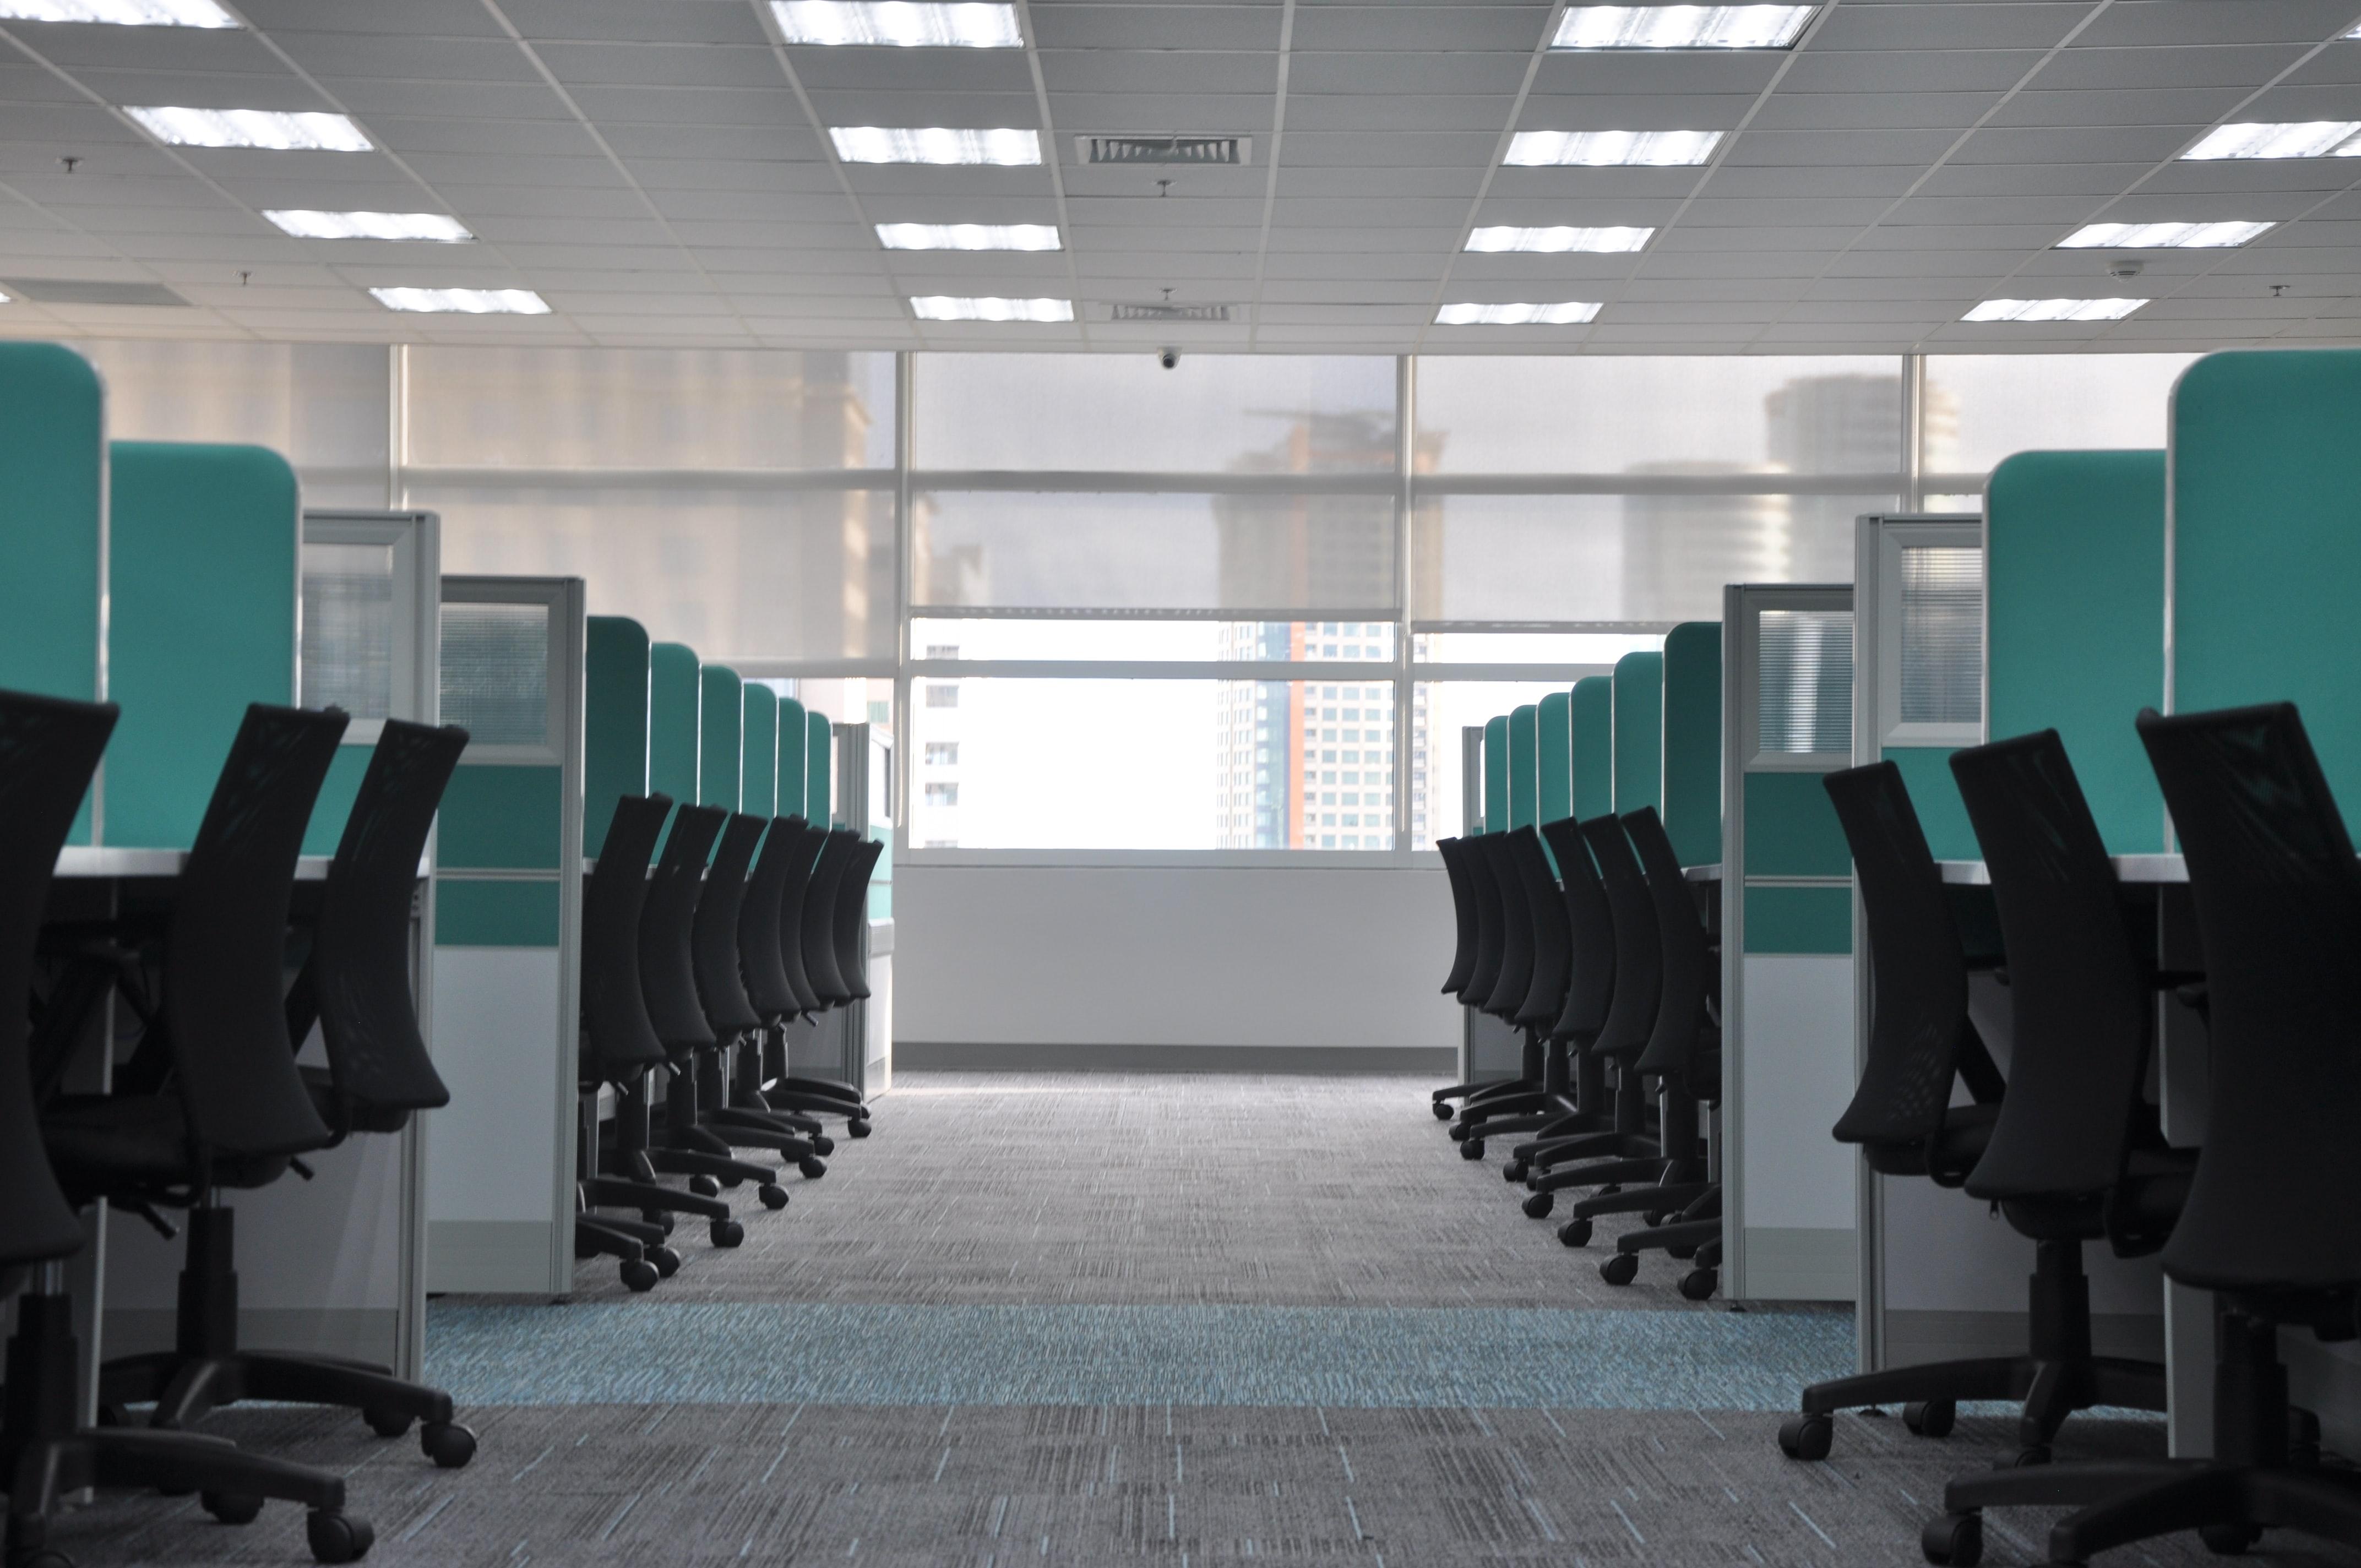 Empty office space. Courtesy of Kate.Sade on Unsplash.